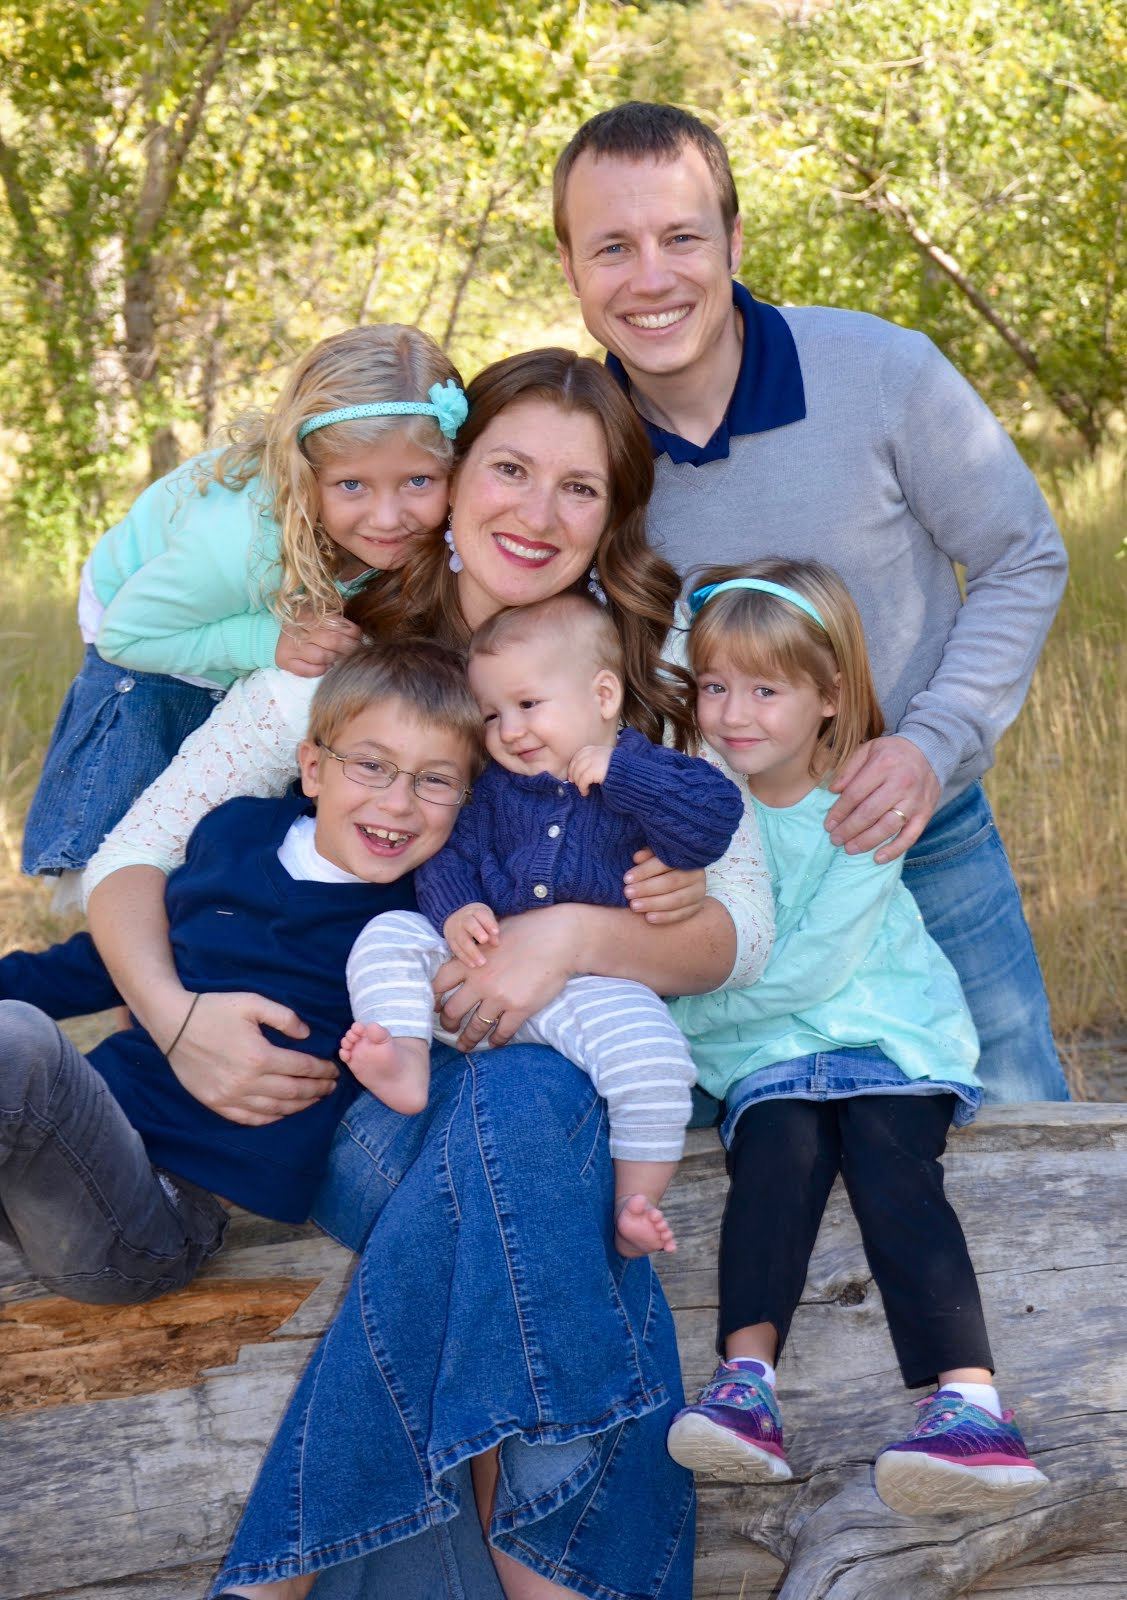 Wagstaff Family